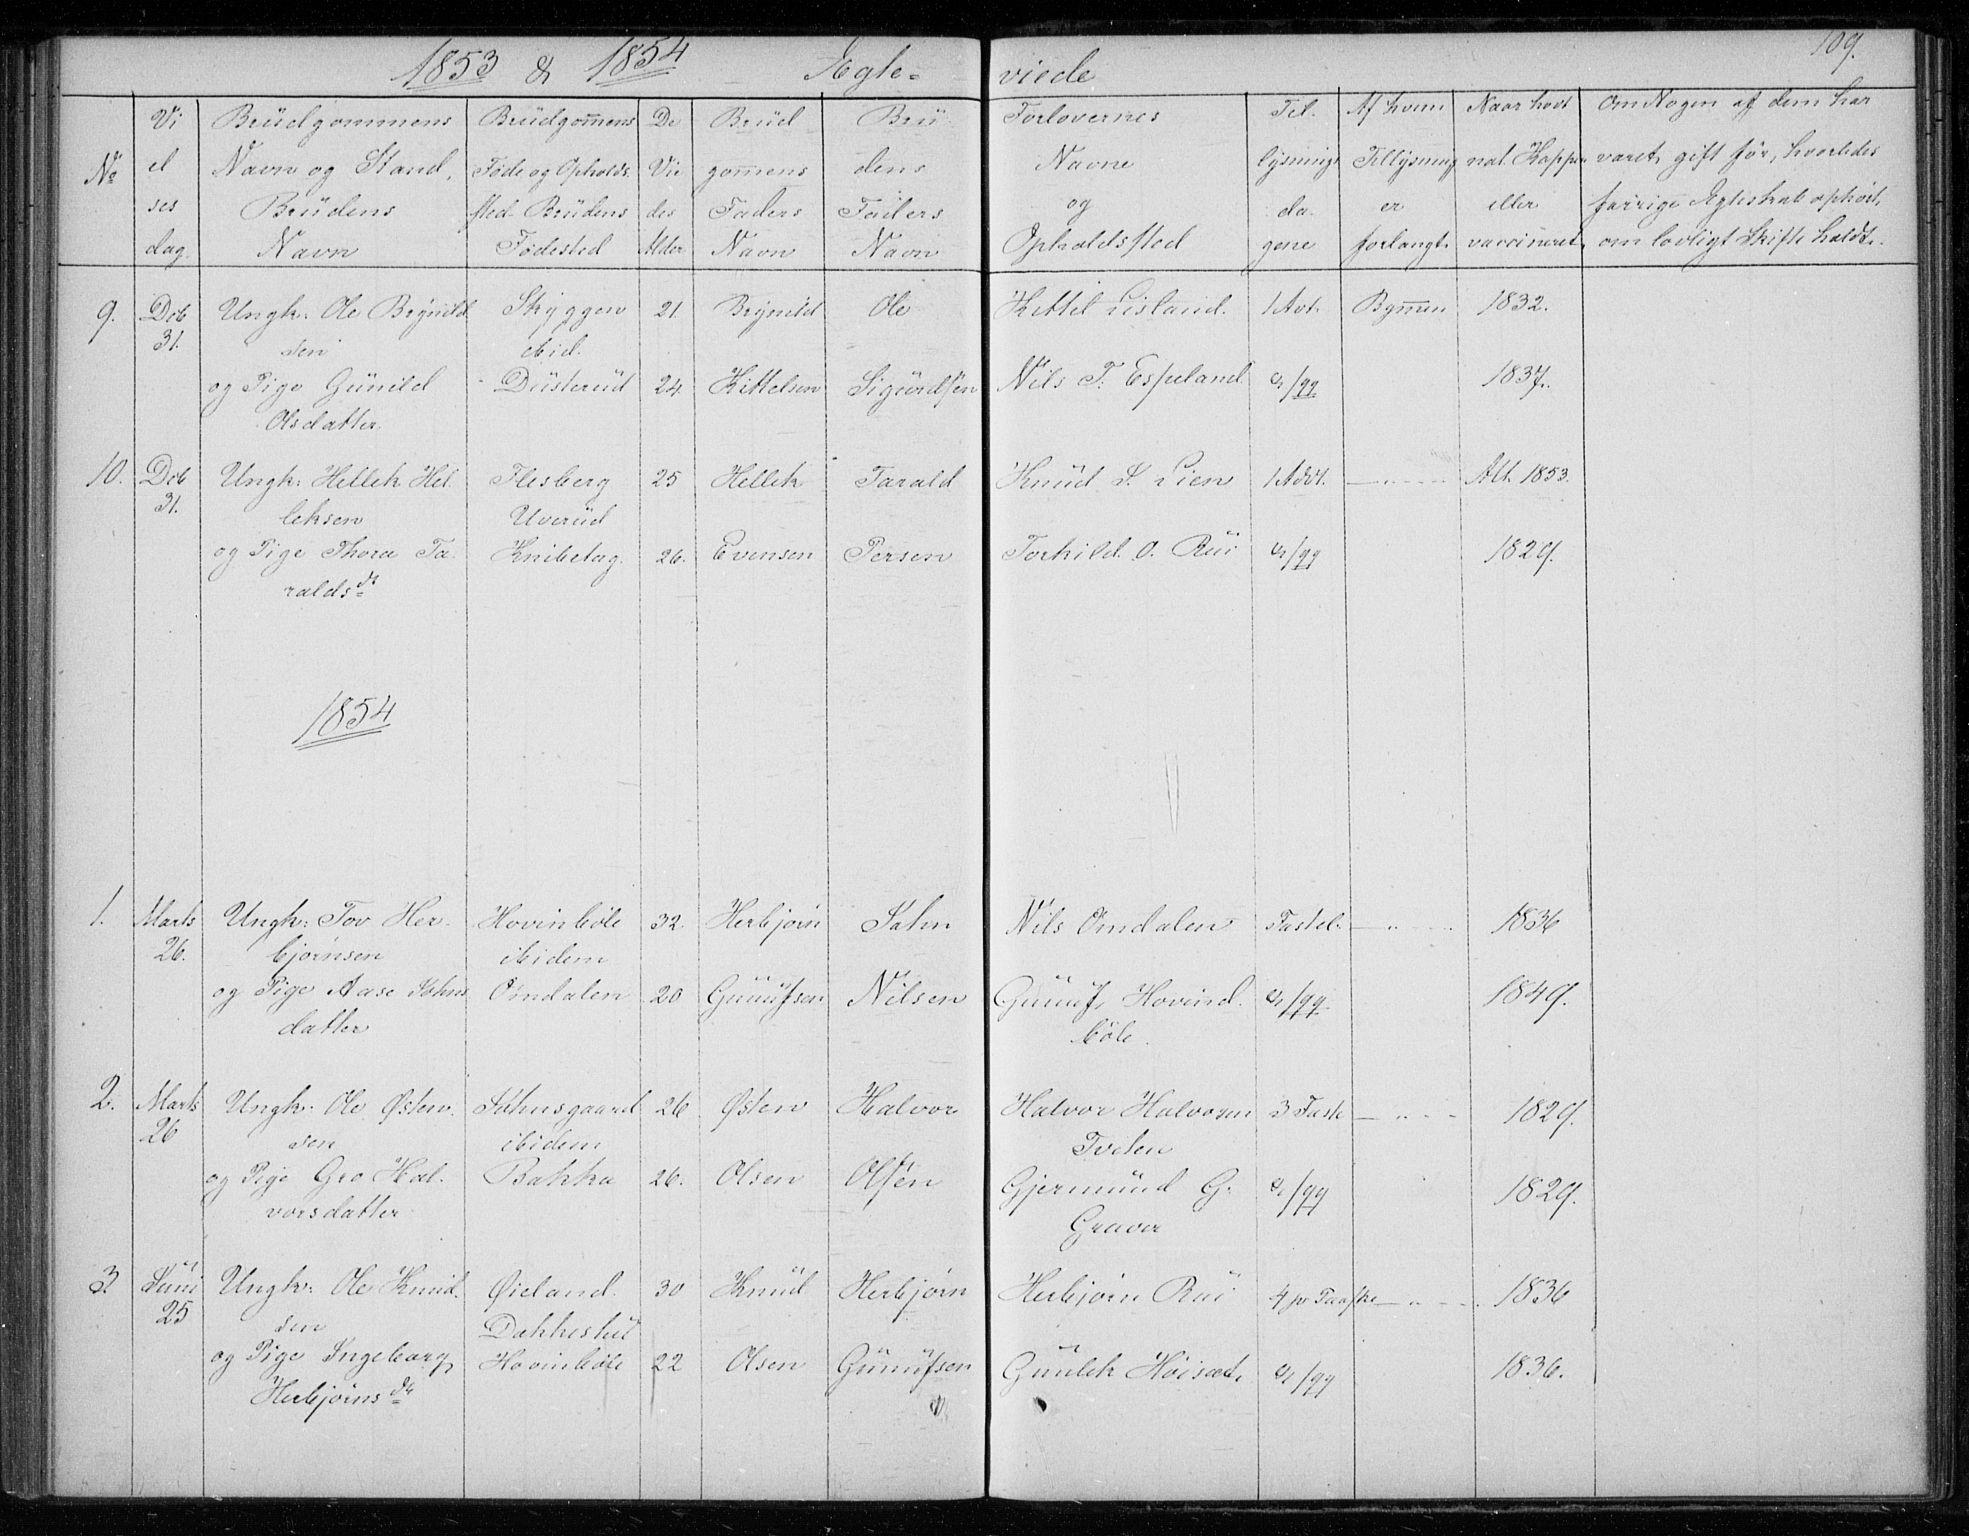 SAKO, Gransherad kirkebøker, F/Fb/L0003: Ministerialbok nr. II 3, 1844-1859, s. 109